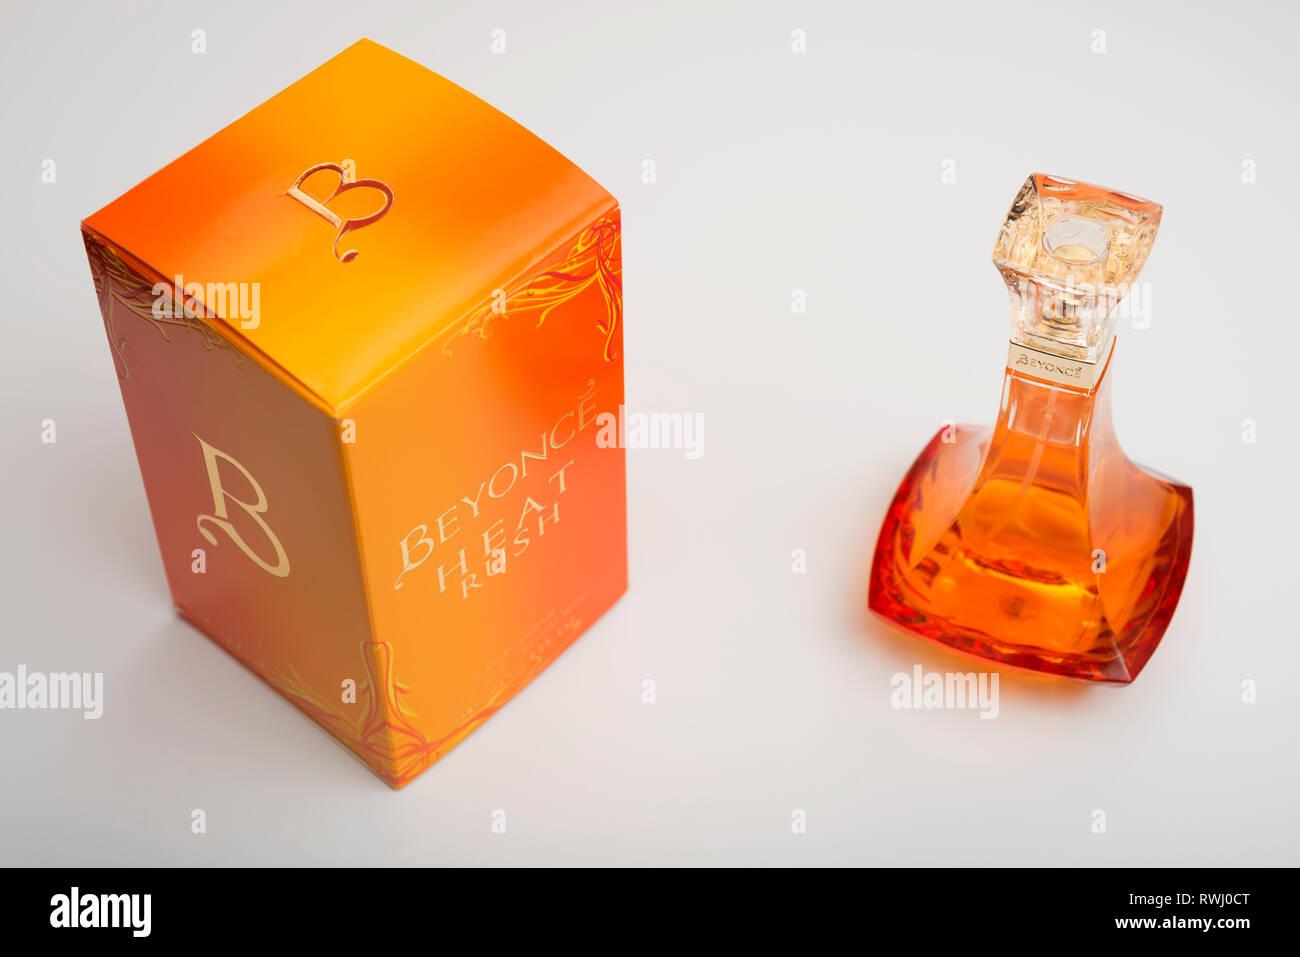 Beyonce Heat Rush perfume - Stock Image